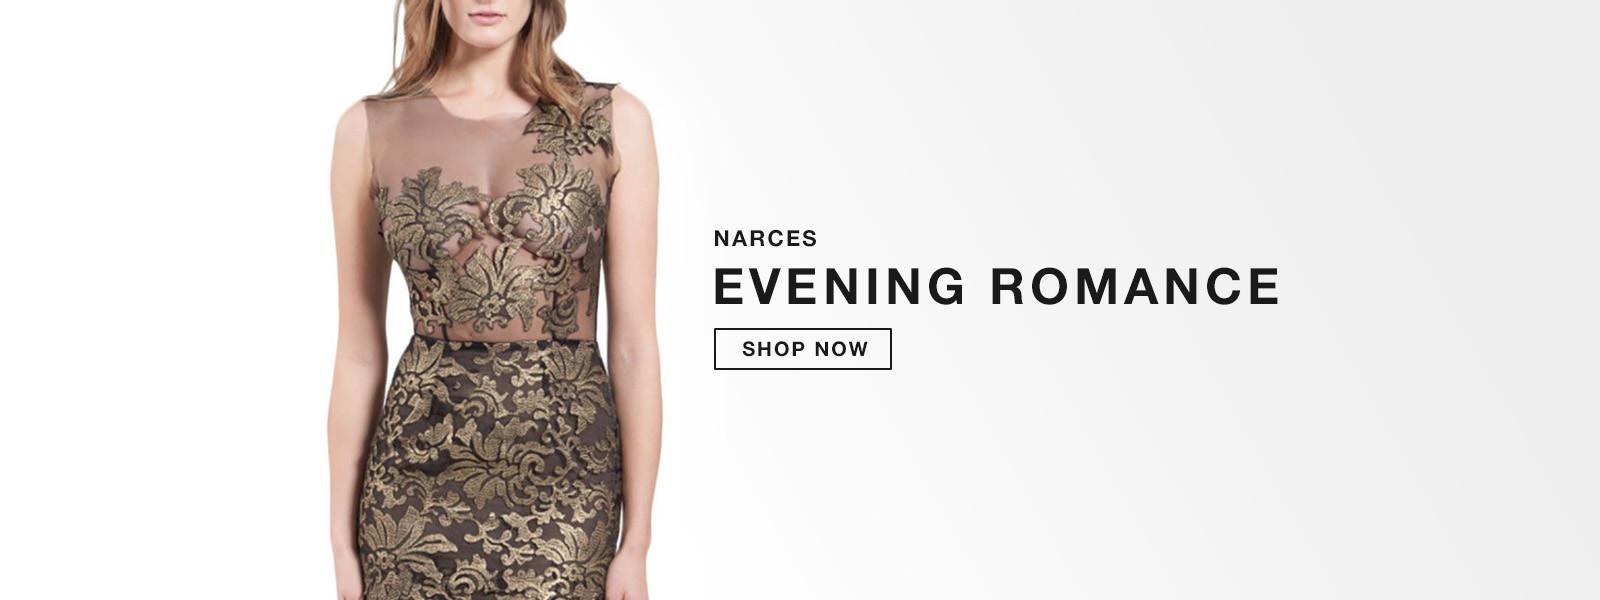 Narces Luxurious Evening Attire